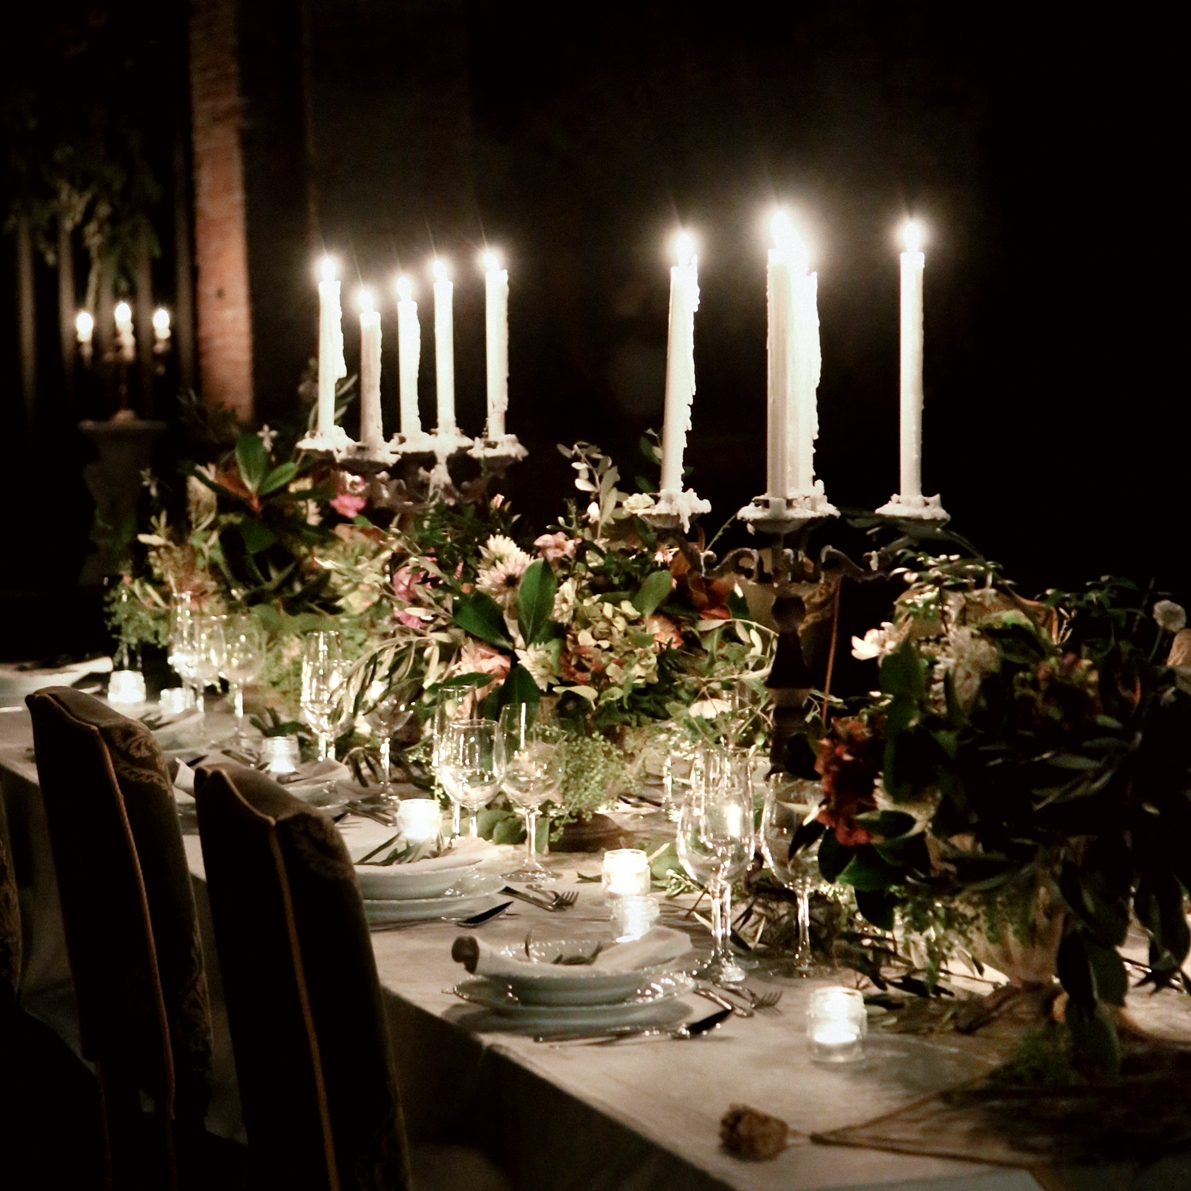 NEW ITALY WEDDING CROP 8.jpg